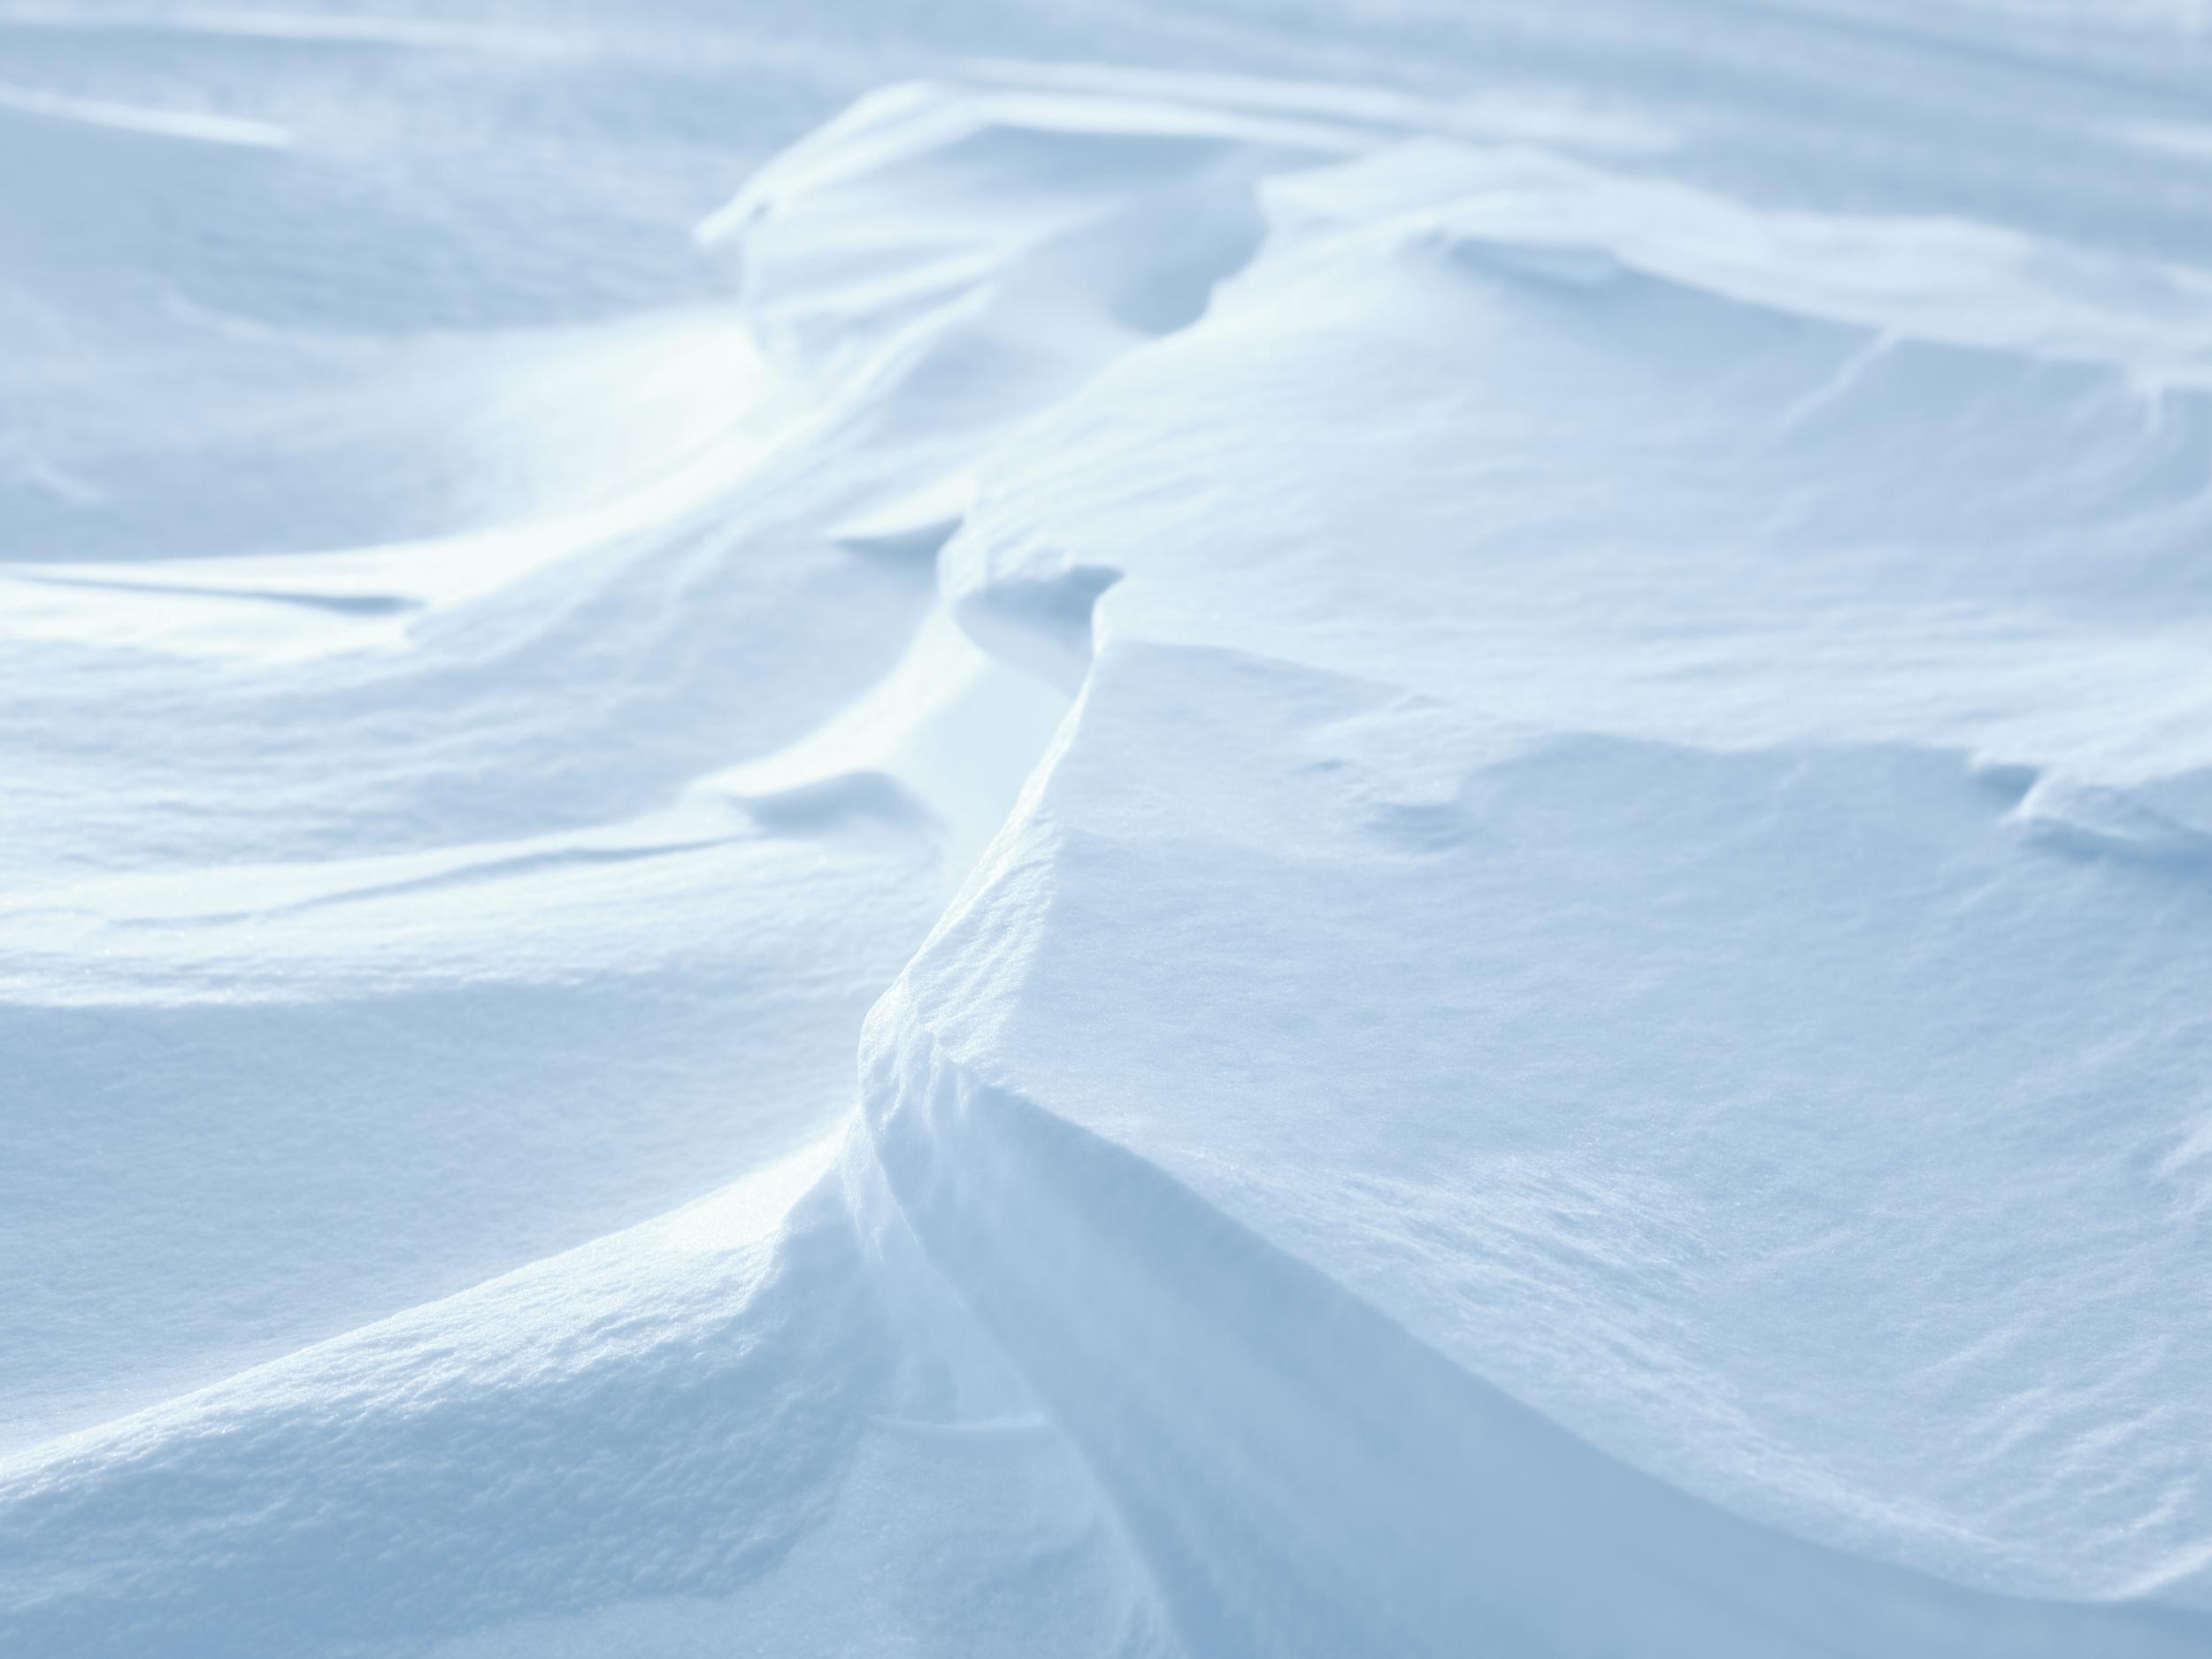 sgeo_20190329_Lappland_Winter_550.jpg